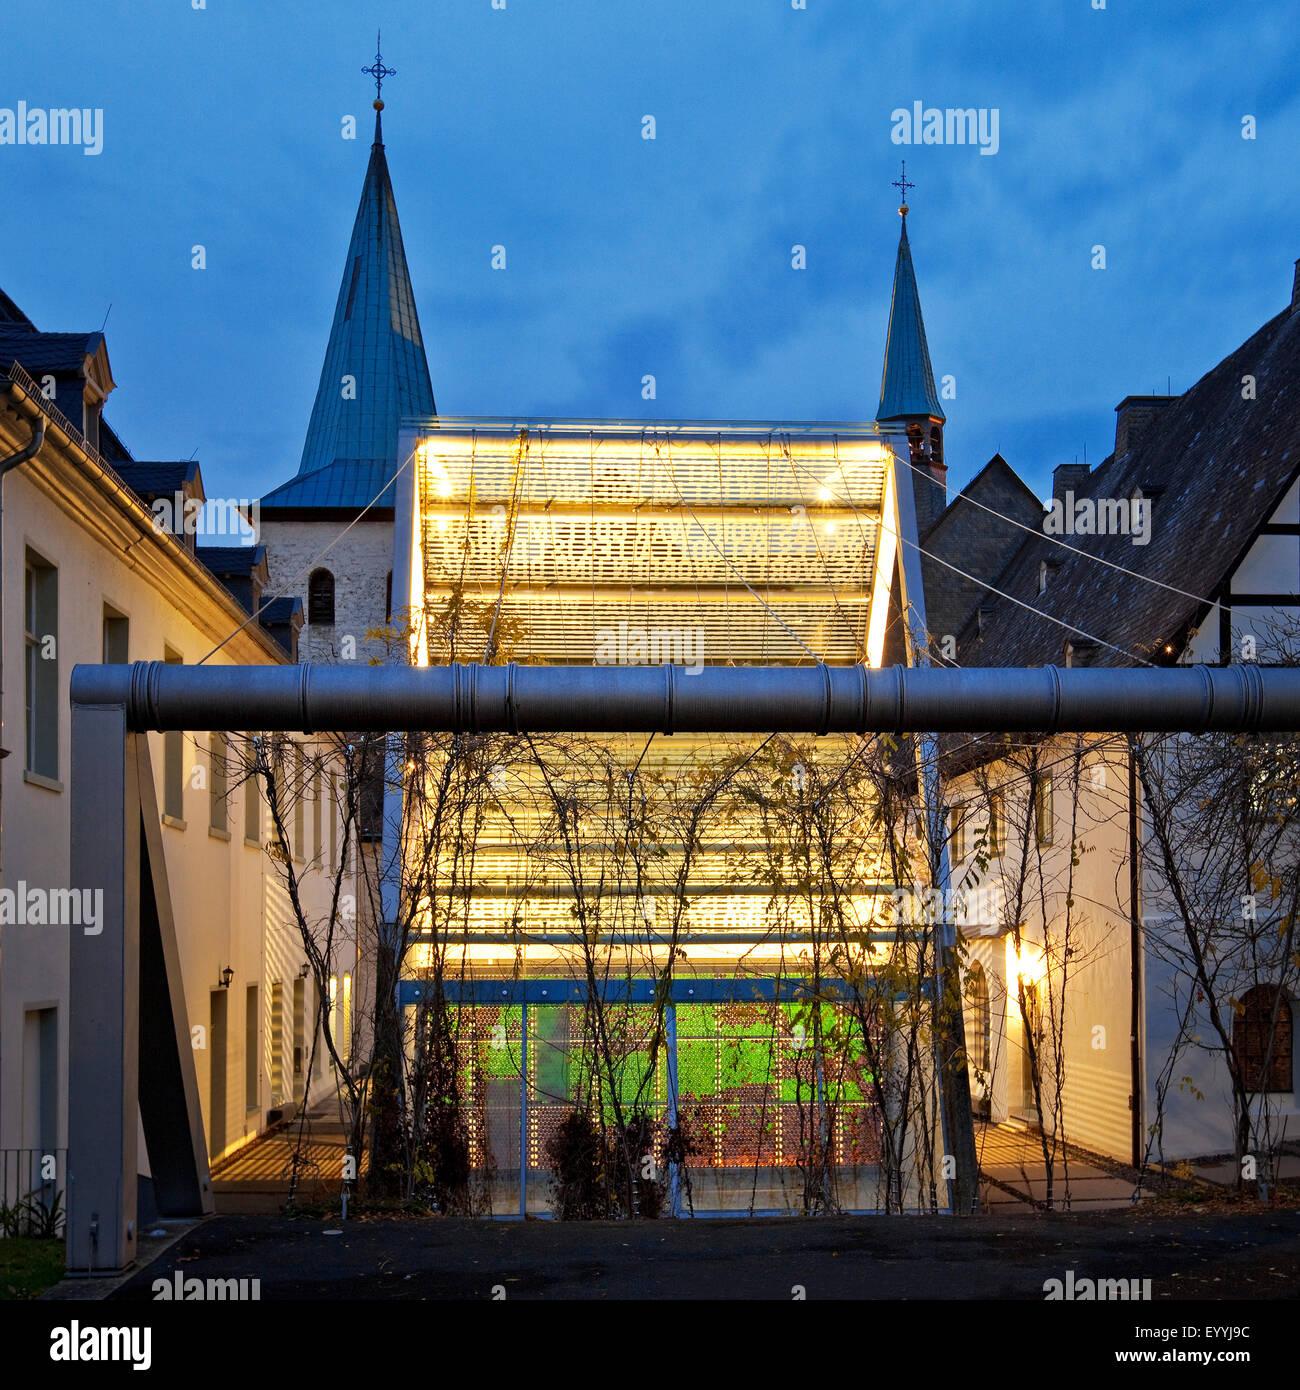 Wedinghausen monastery with light house 'Lichthaus' in the evening, Germany, North Rhine-Westphalia, Sauerland, Stock Photo